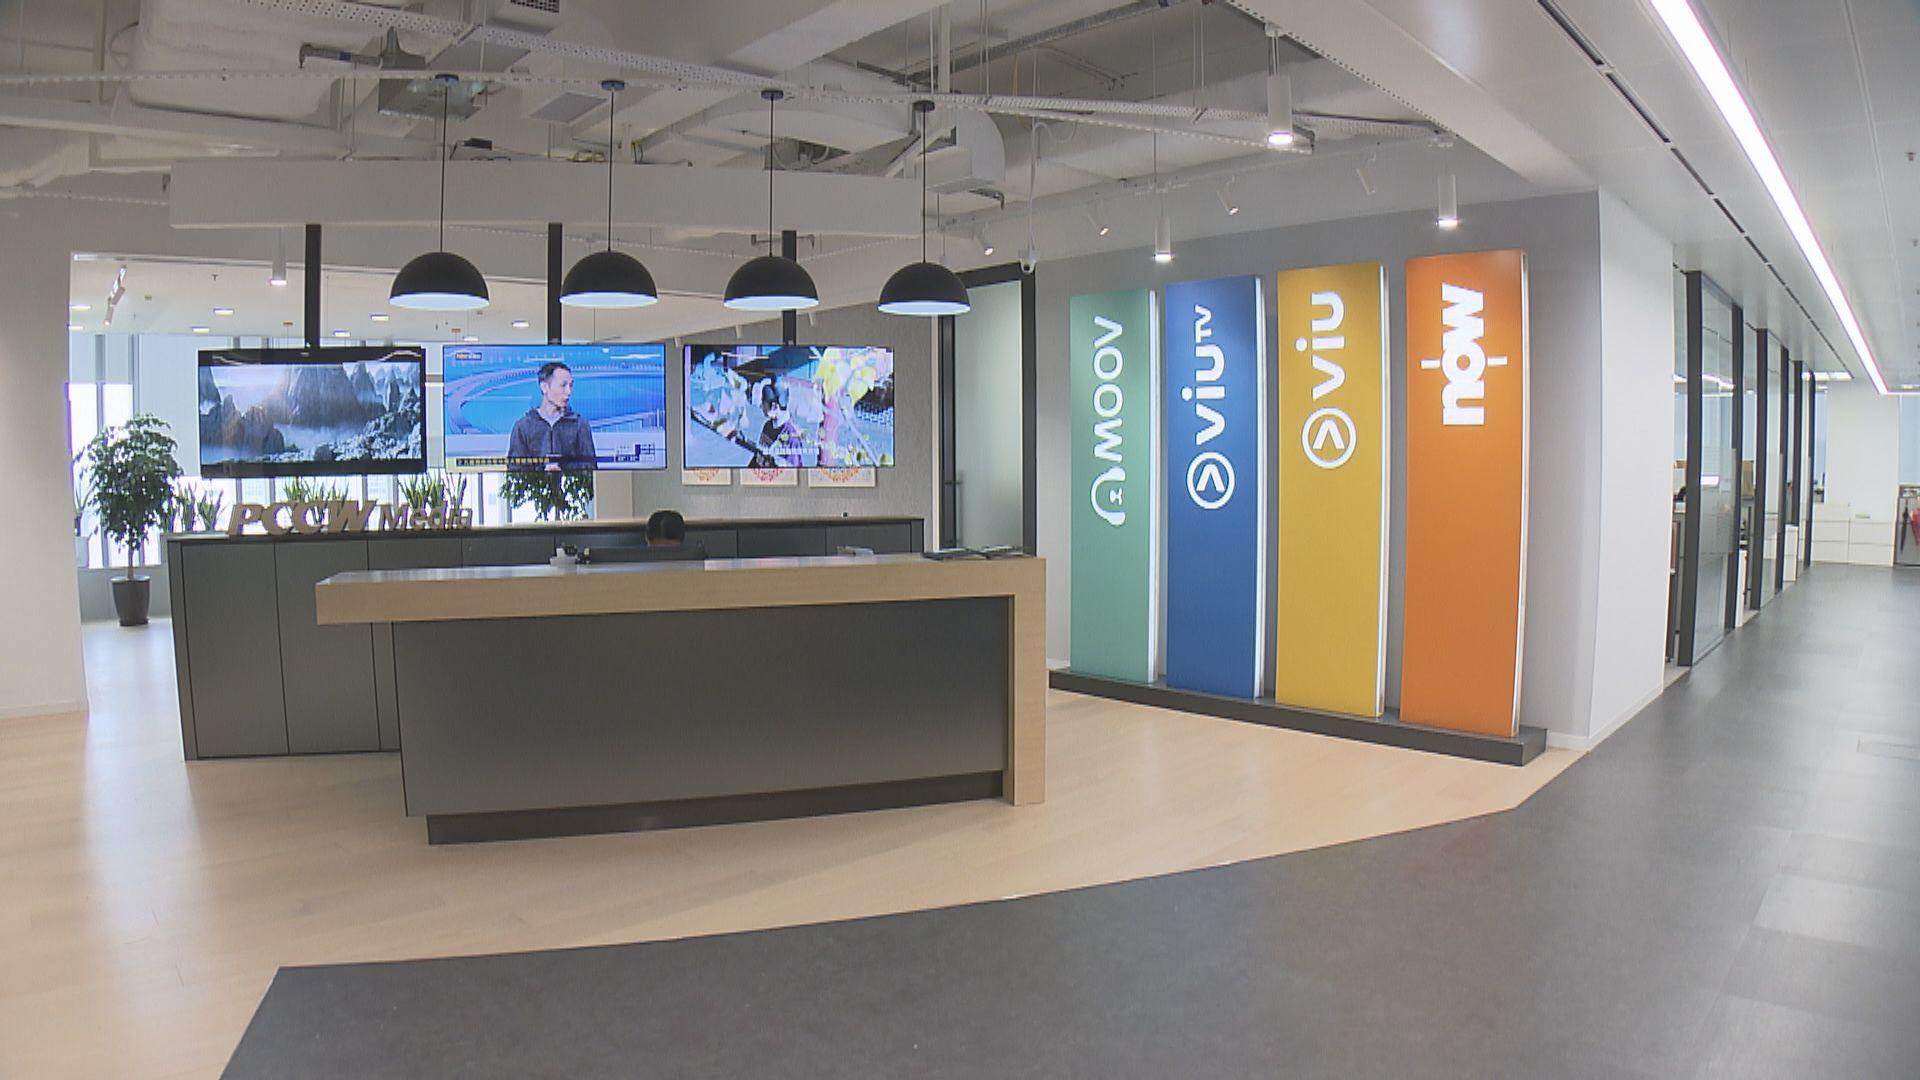 ViuTV歡迎通訊局決定 指編排節目更具彈性